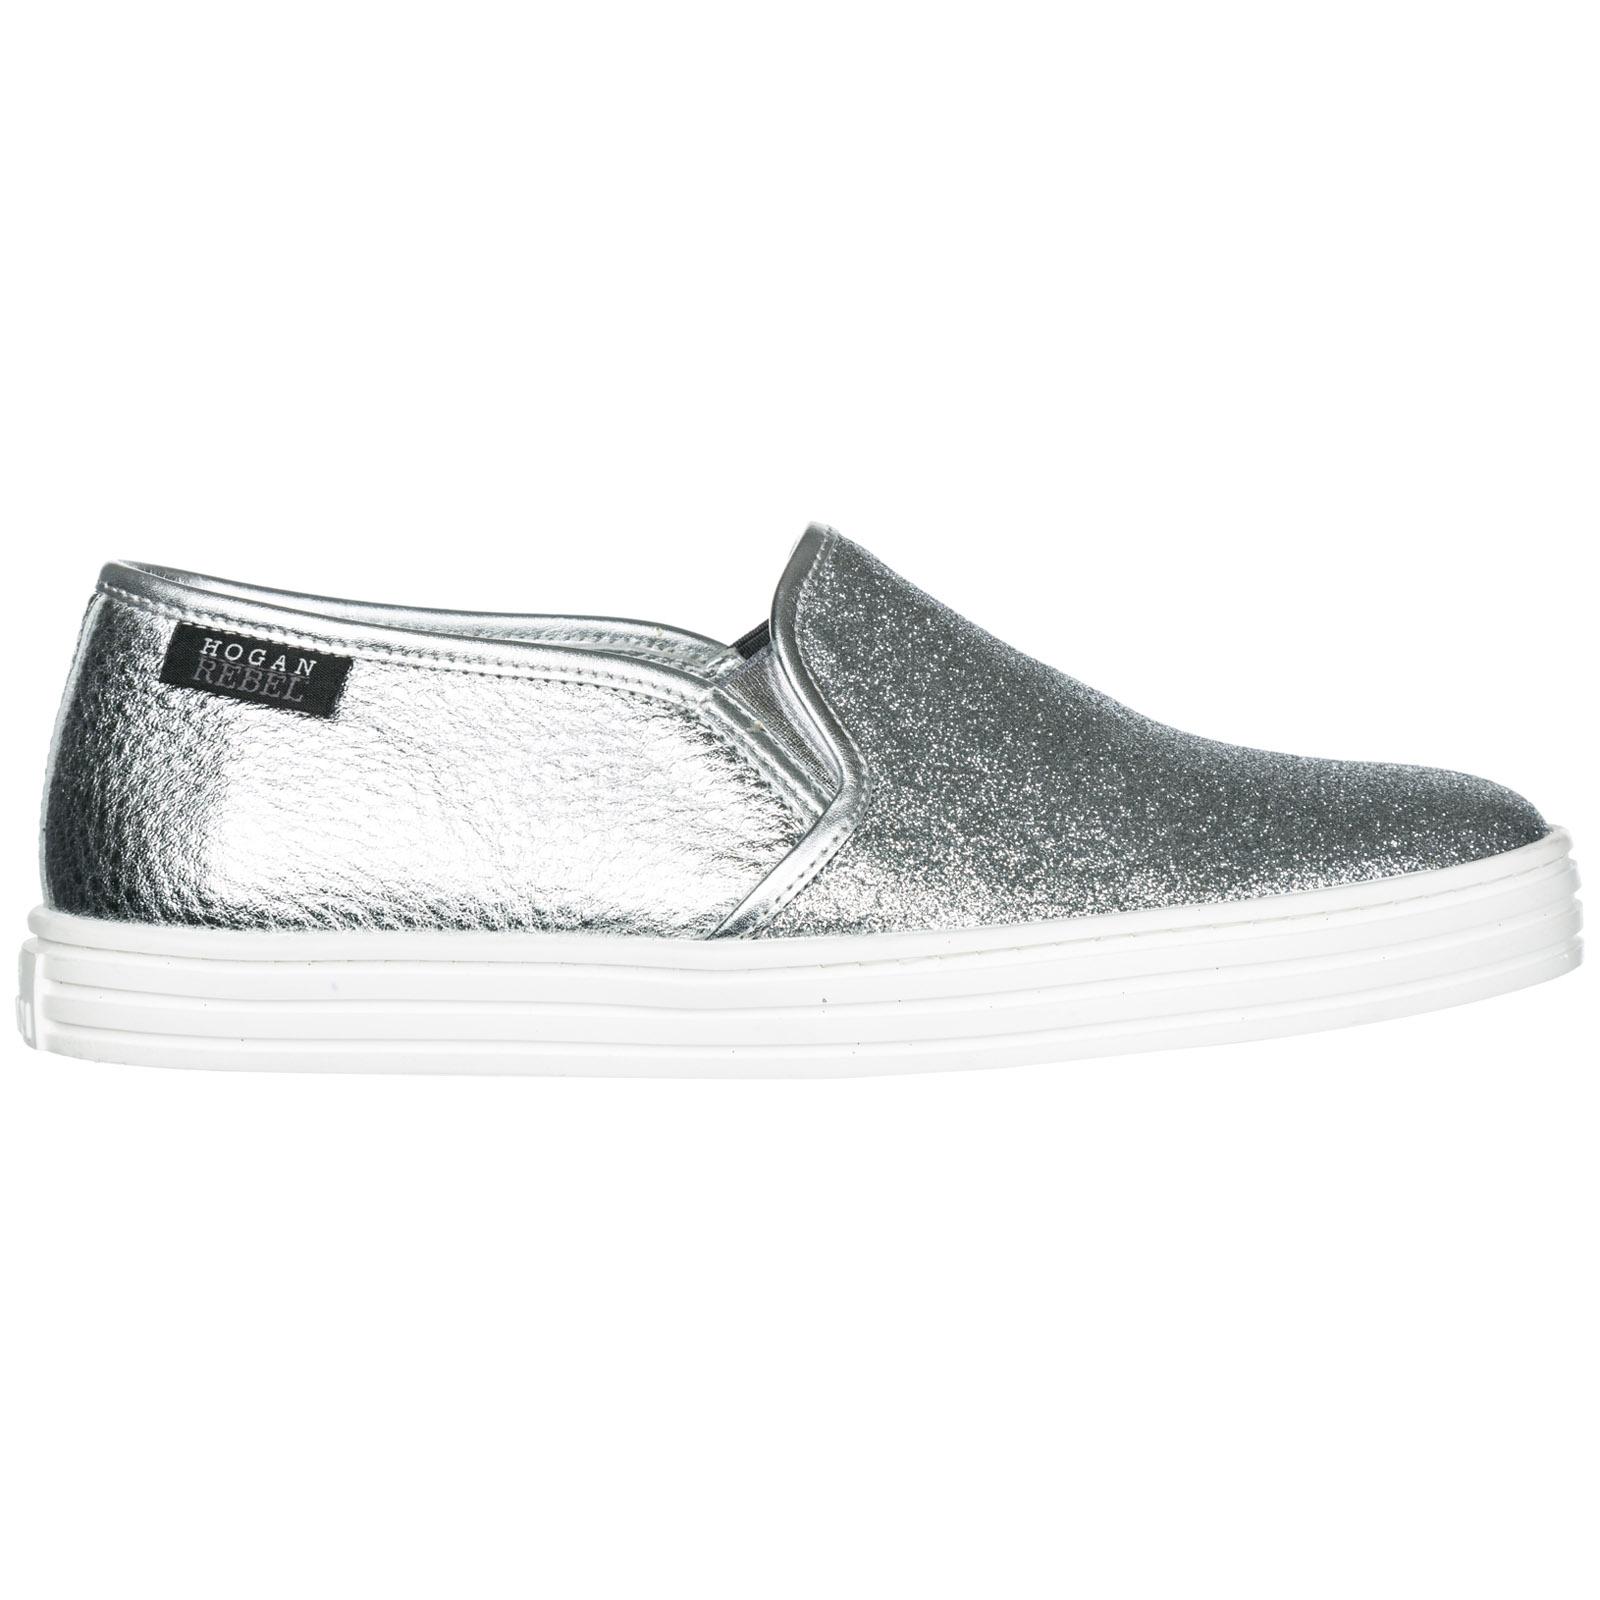 Hogan Rebel Women's Leather Slip On Sneakers R141 In Silver | ModeSens